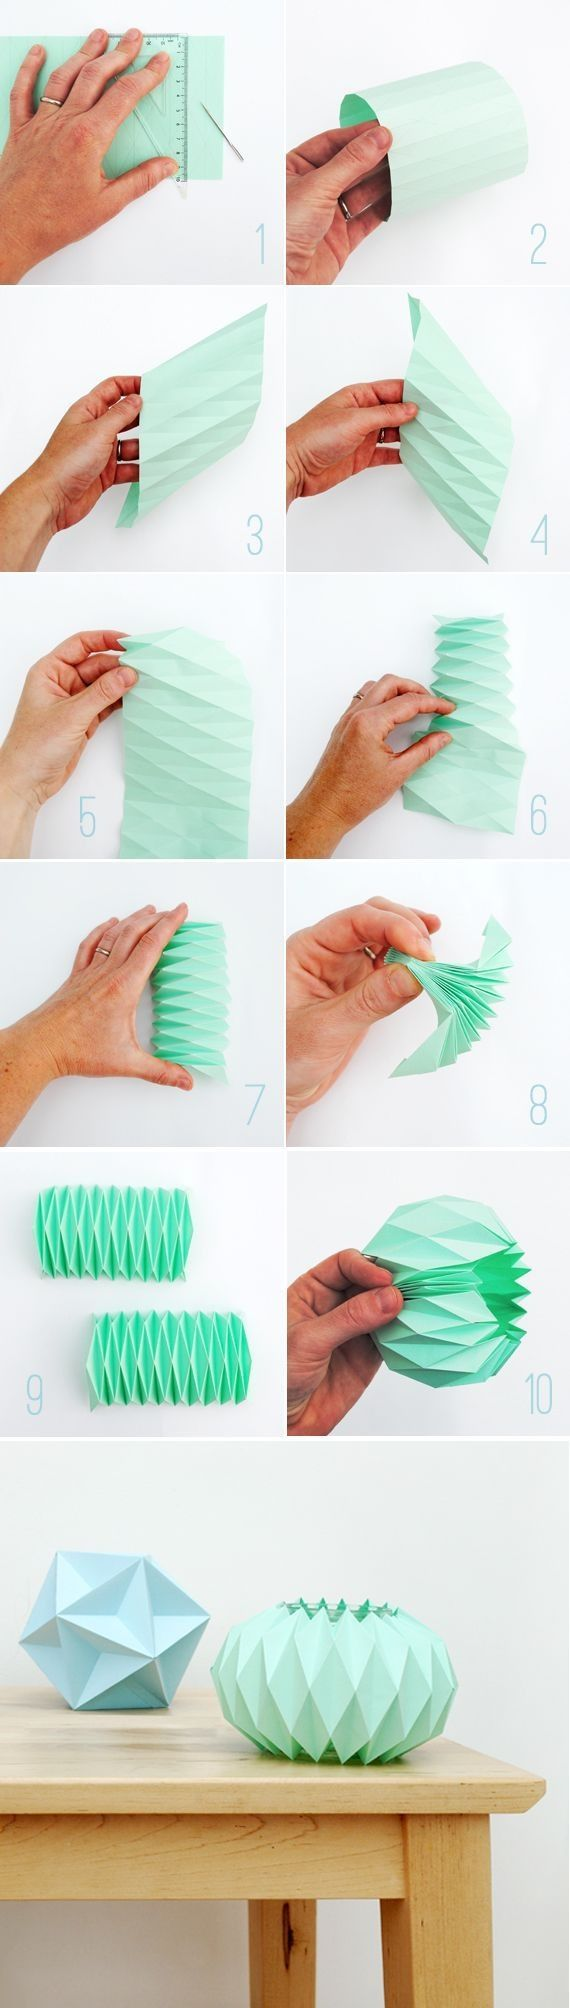 vase en papier  Ремесла Бумажные гирлянды Бумага для